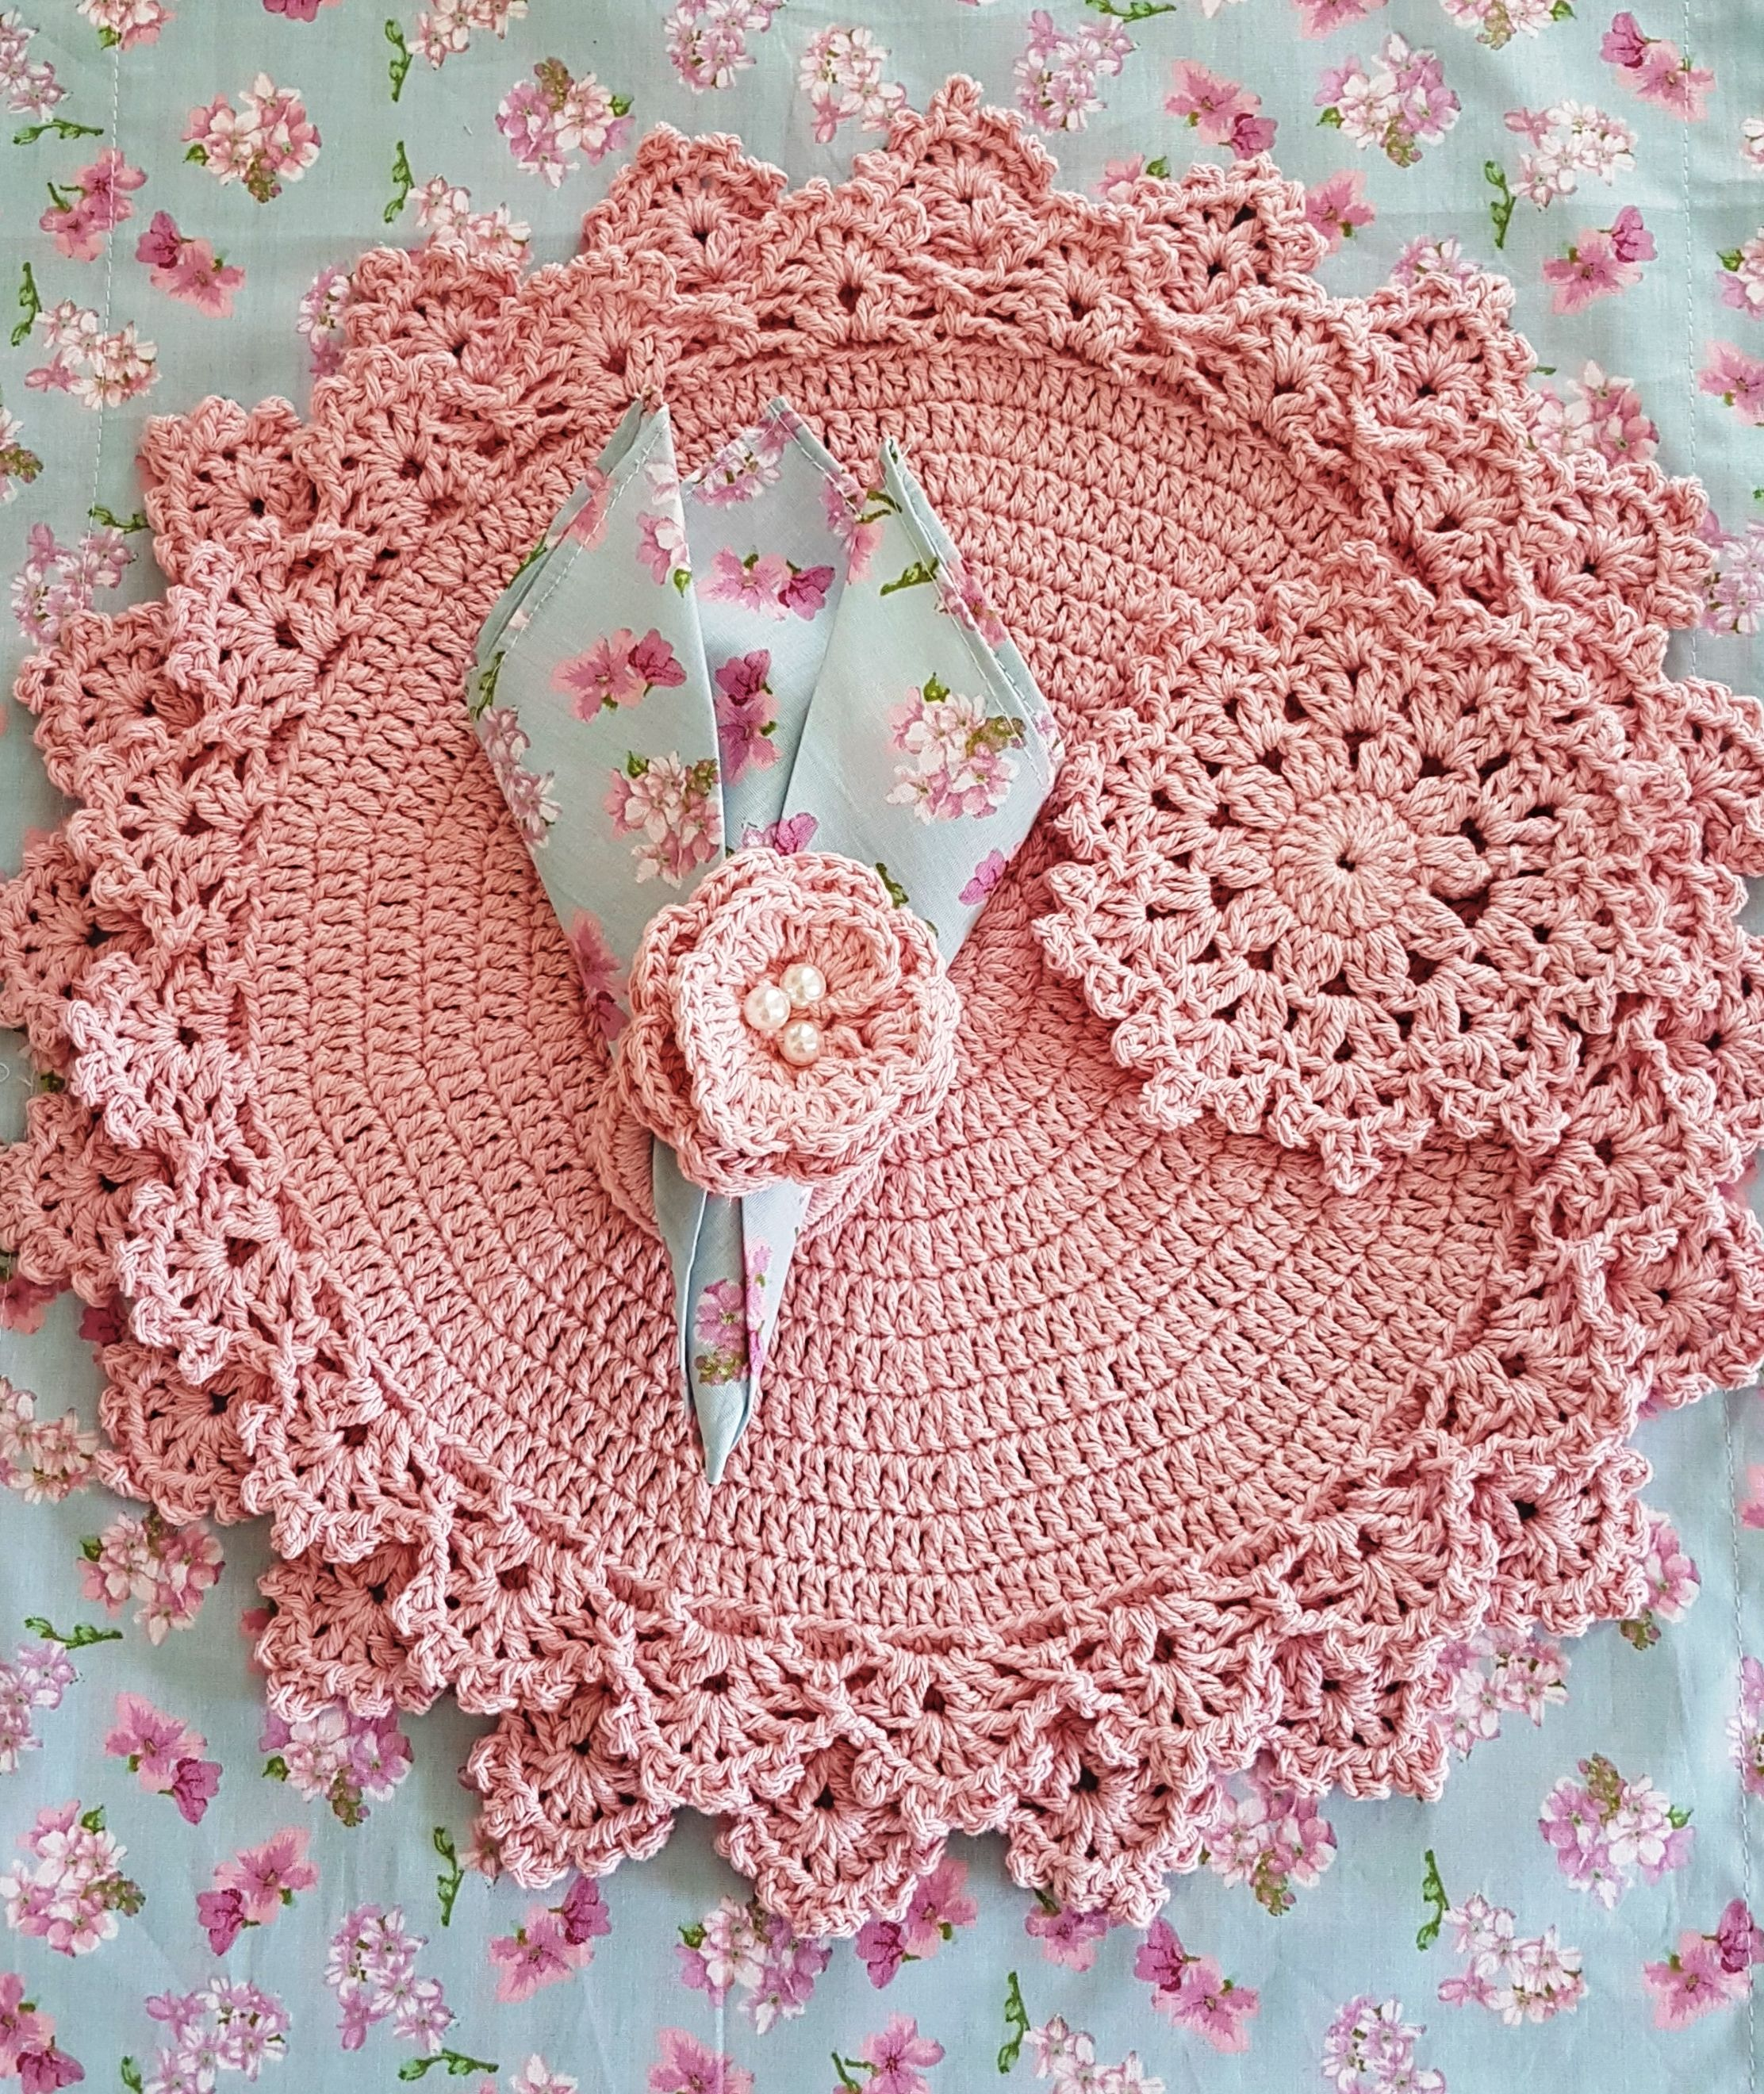 Jogo Americano Dupla Face Floral Rosa E Xadrez Rosa Guardanapo De Boca Floral Souplast De Crochet Porta Copo E Tig Desenleri Tig Motifleri Tig Isi Sablonu